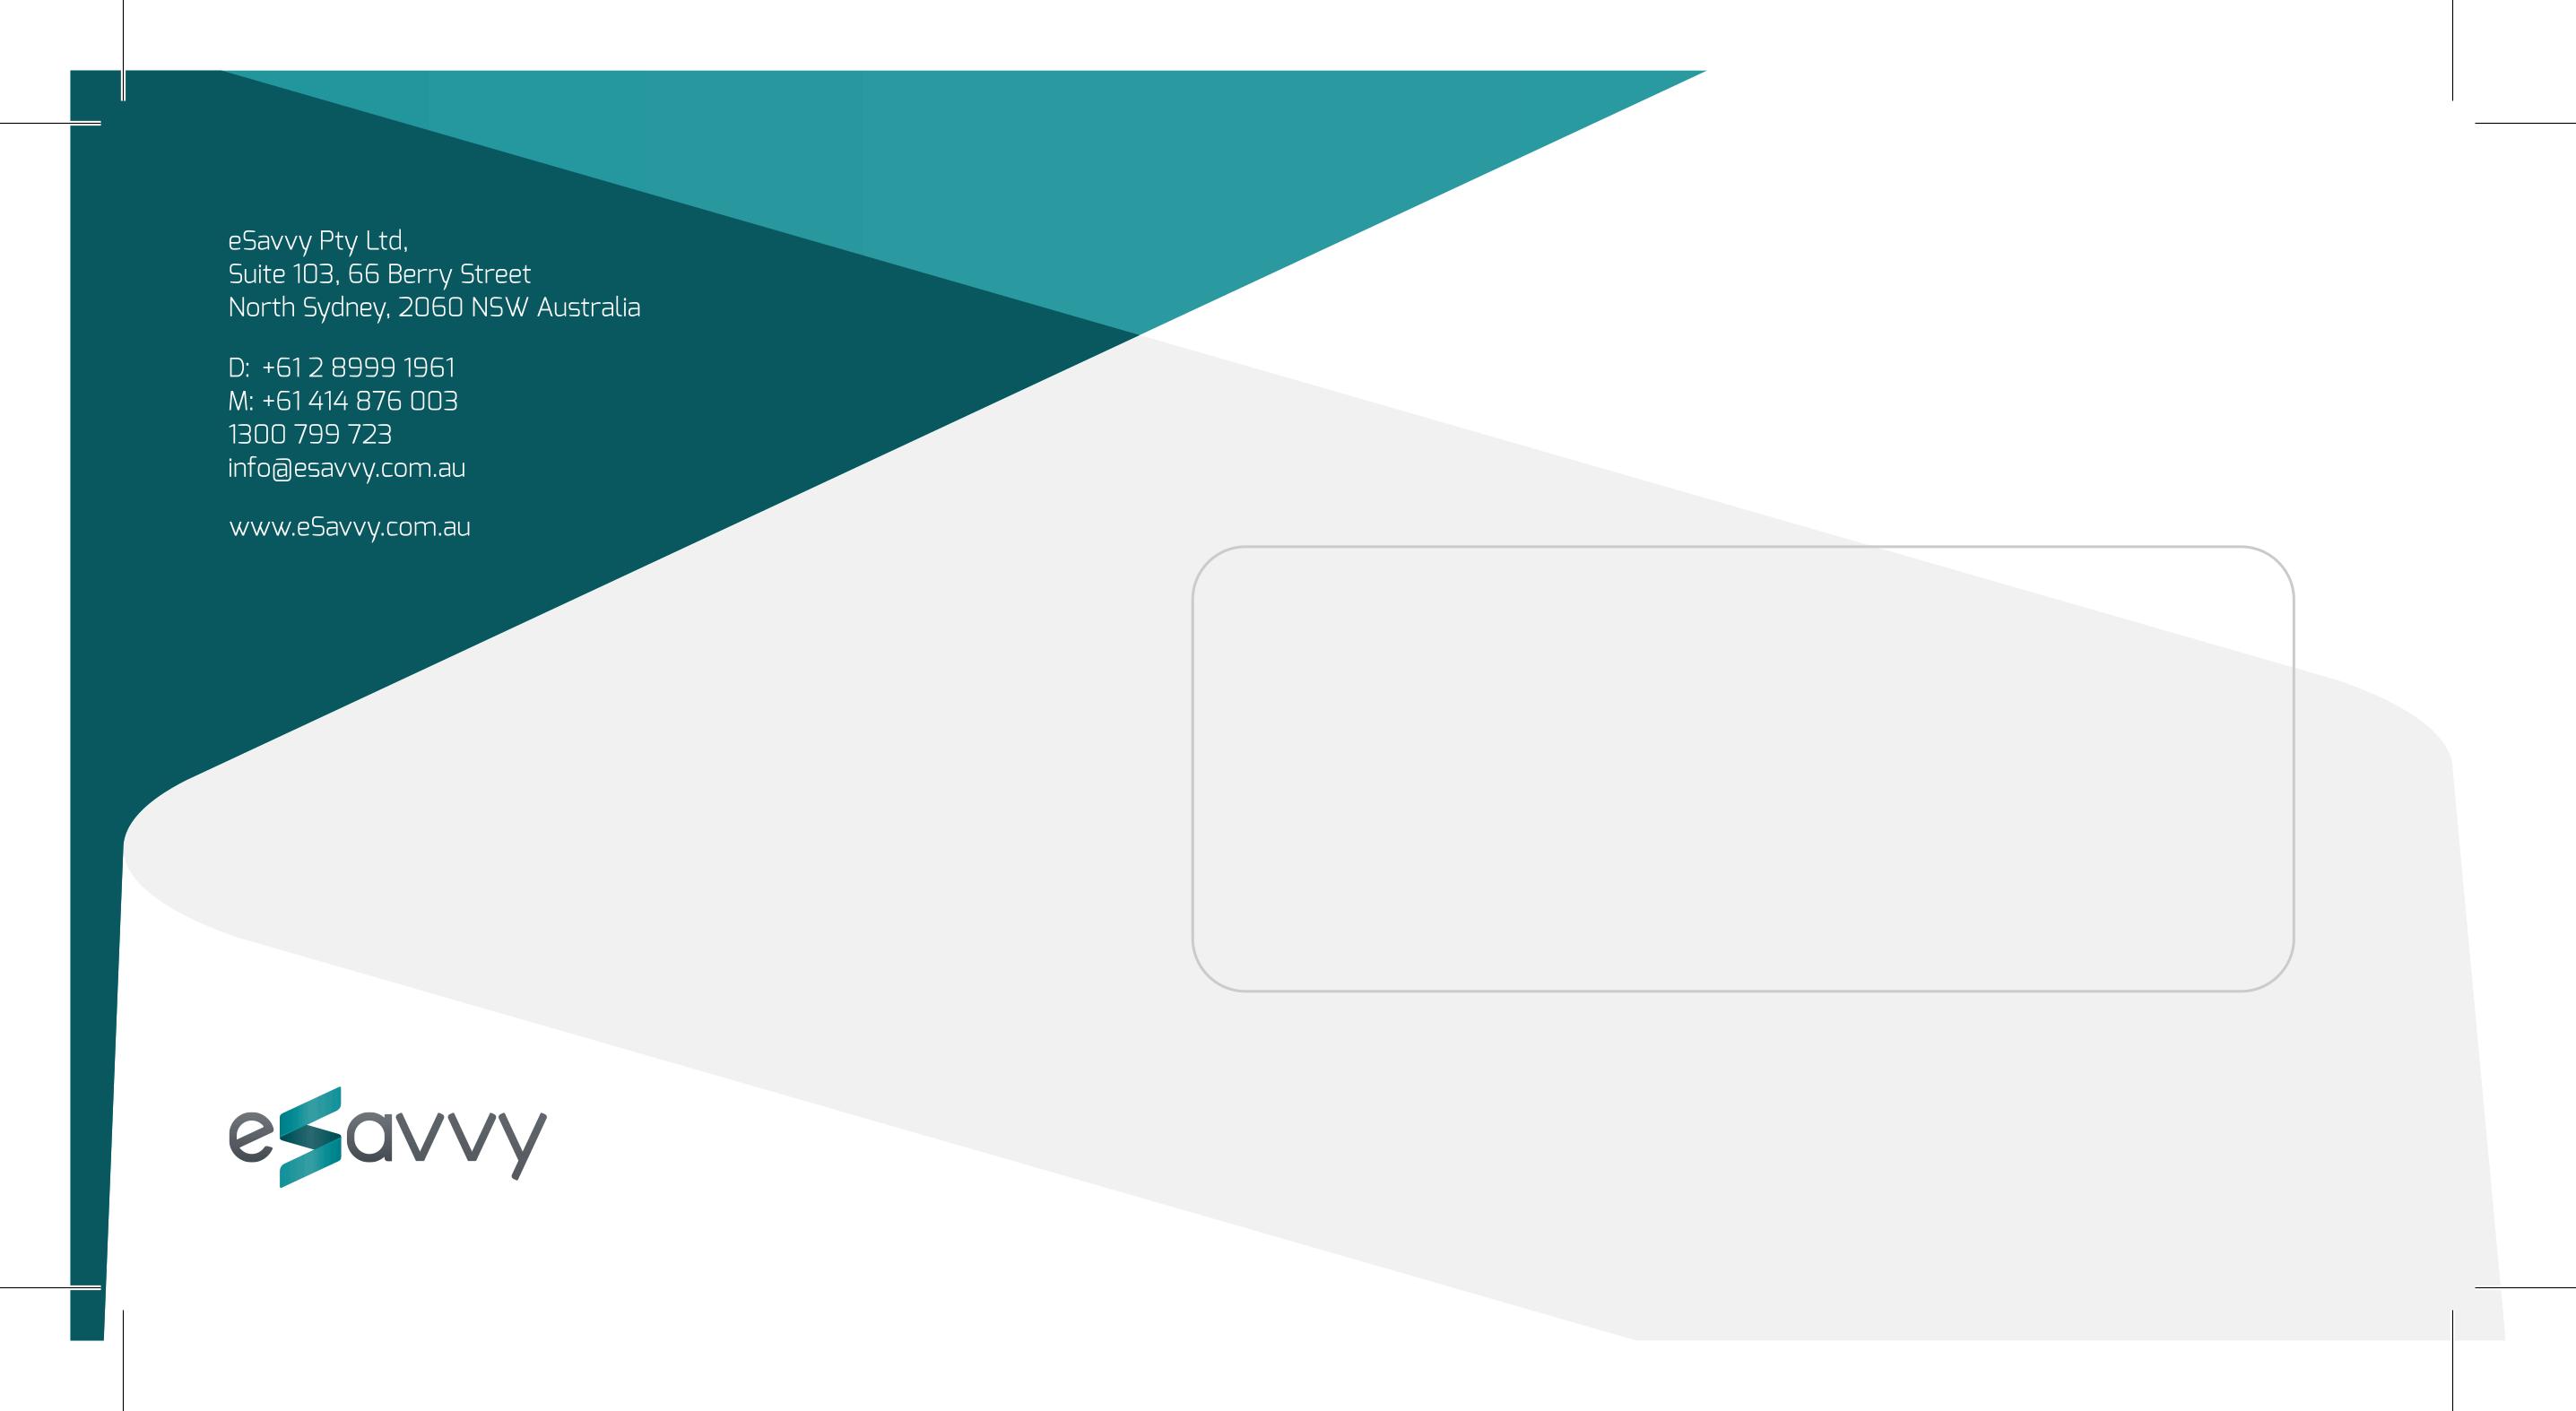 eSavvy - Envelope Design